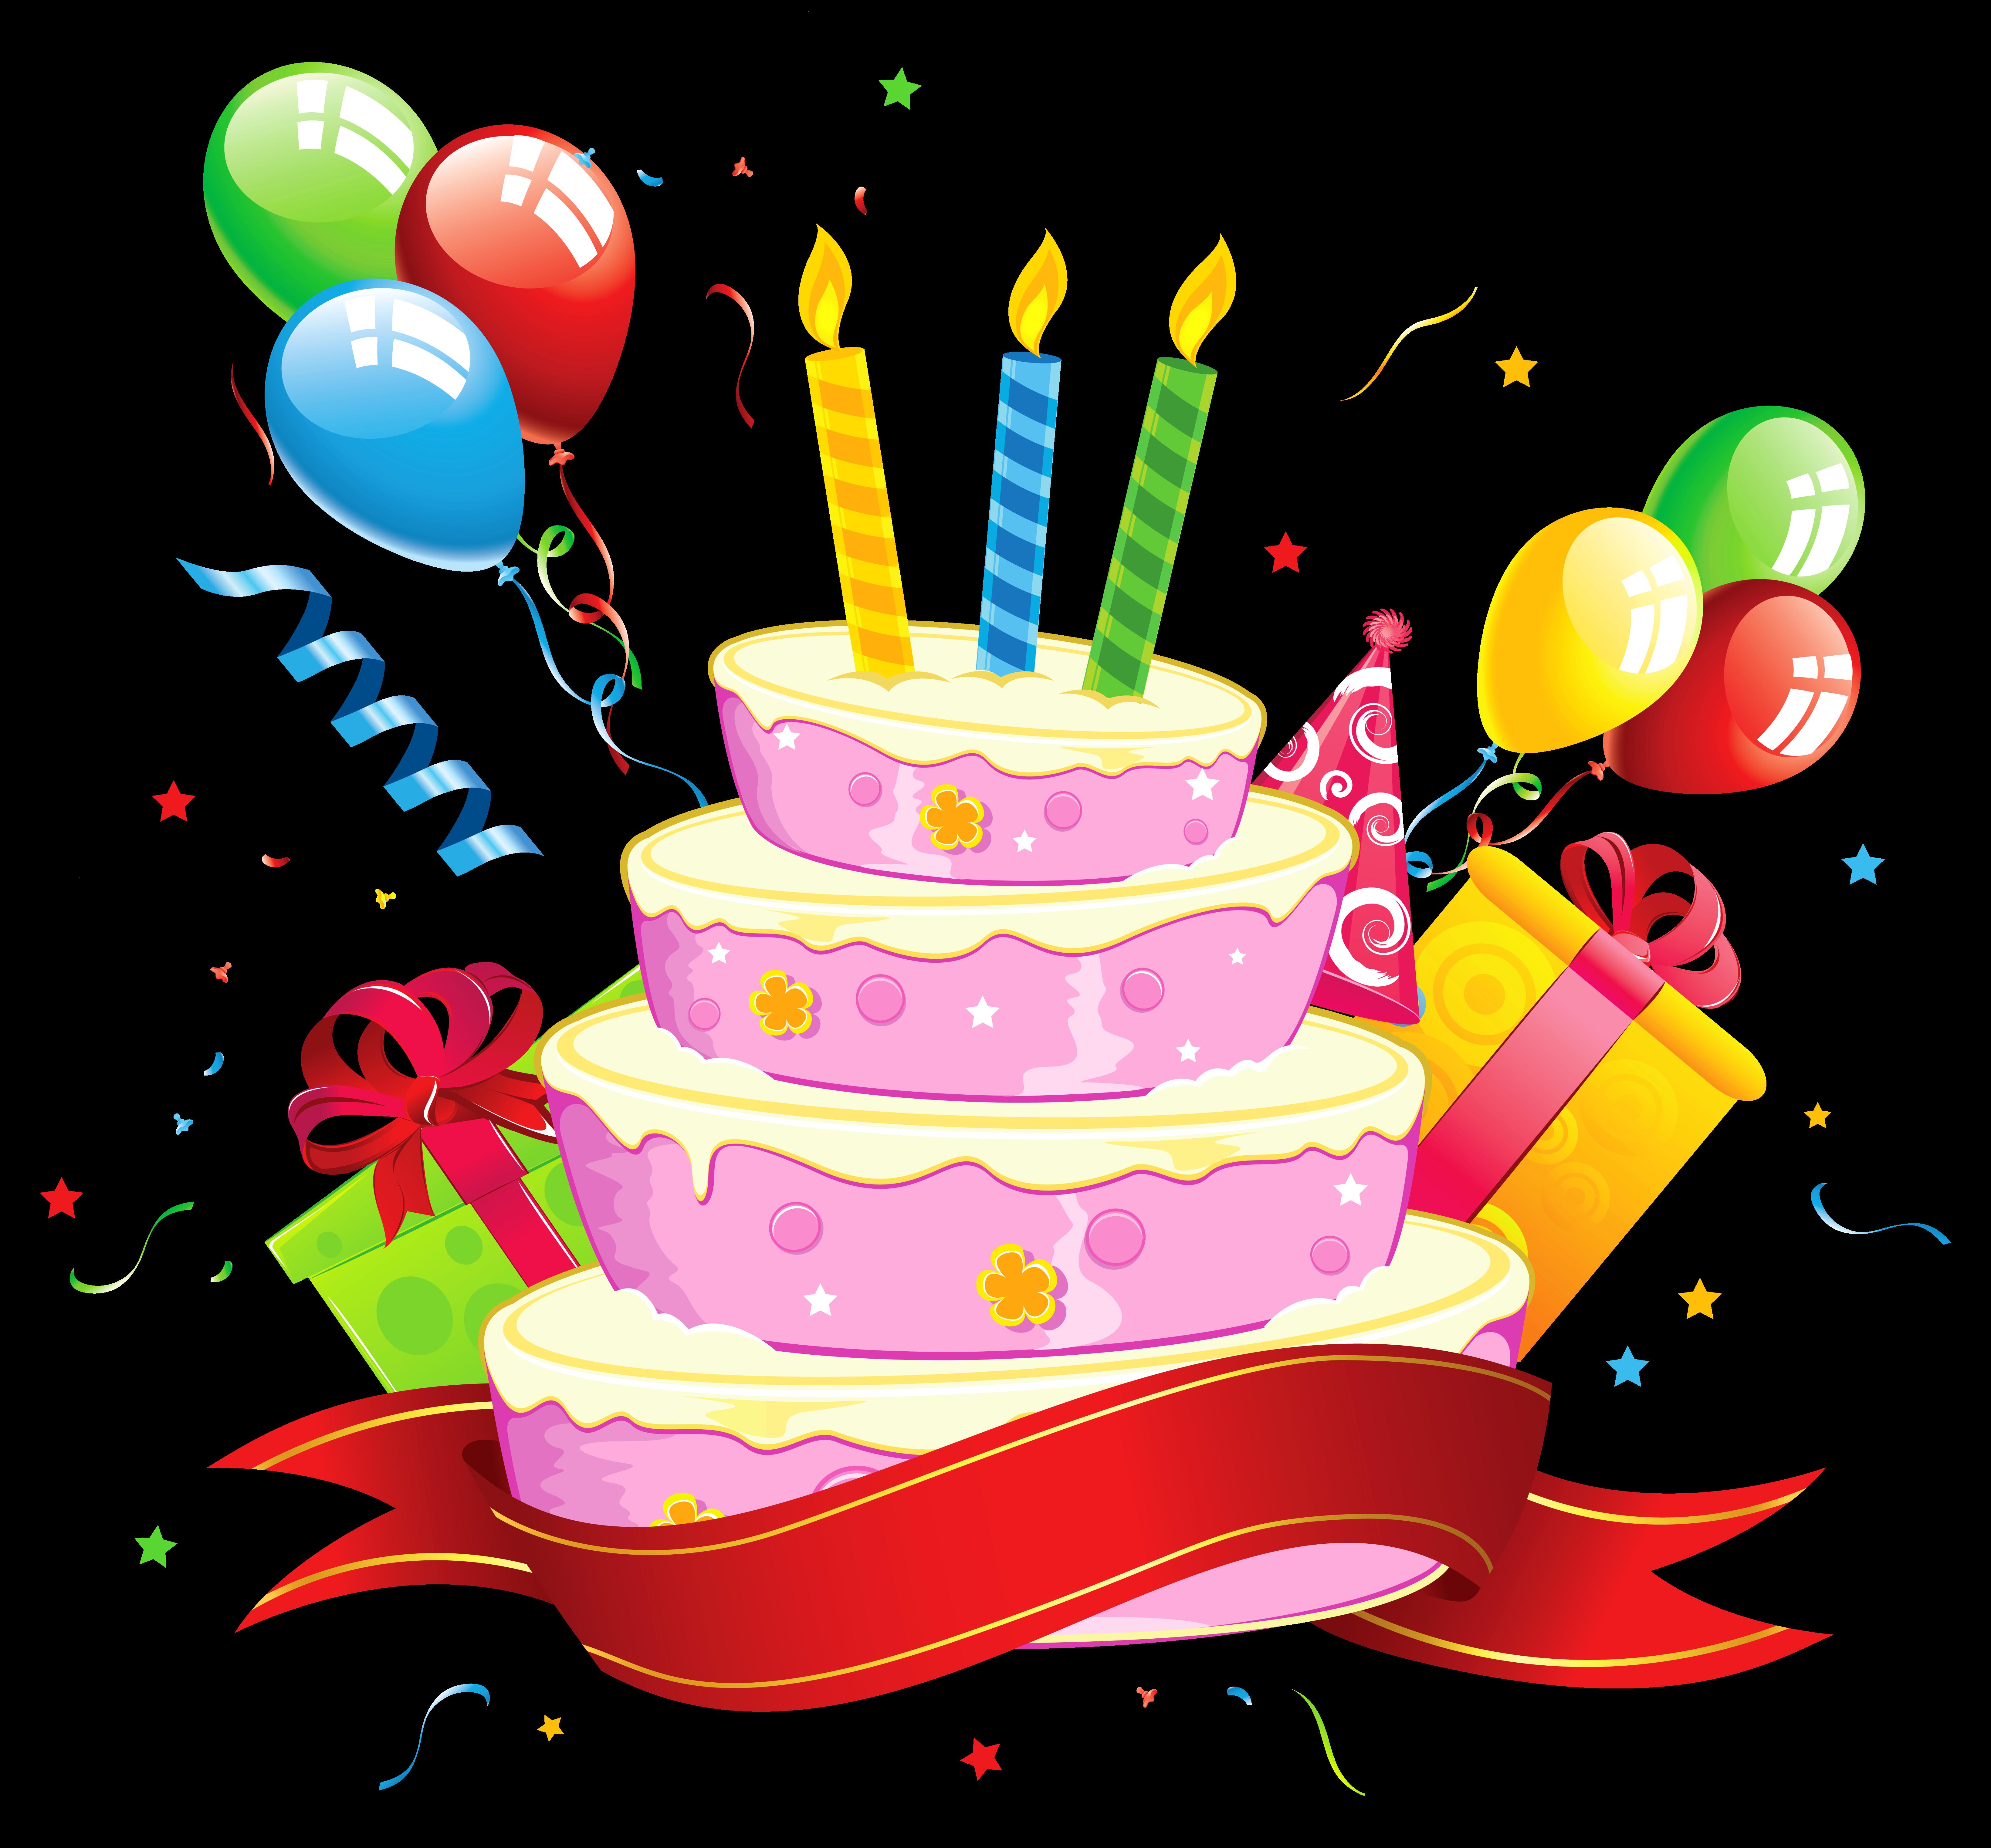 Birthday cake art clip clip art royalty free library Birthday cake Party Clip art - Birthday 6561*6091 transprent Png ... clip art royalty free library